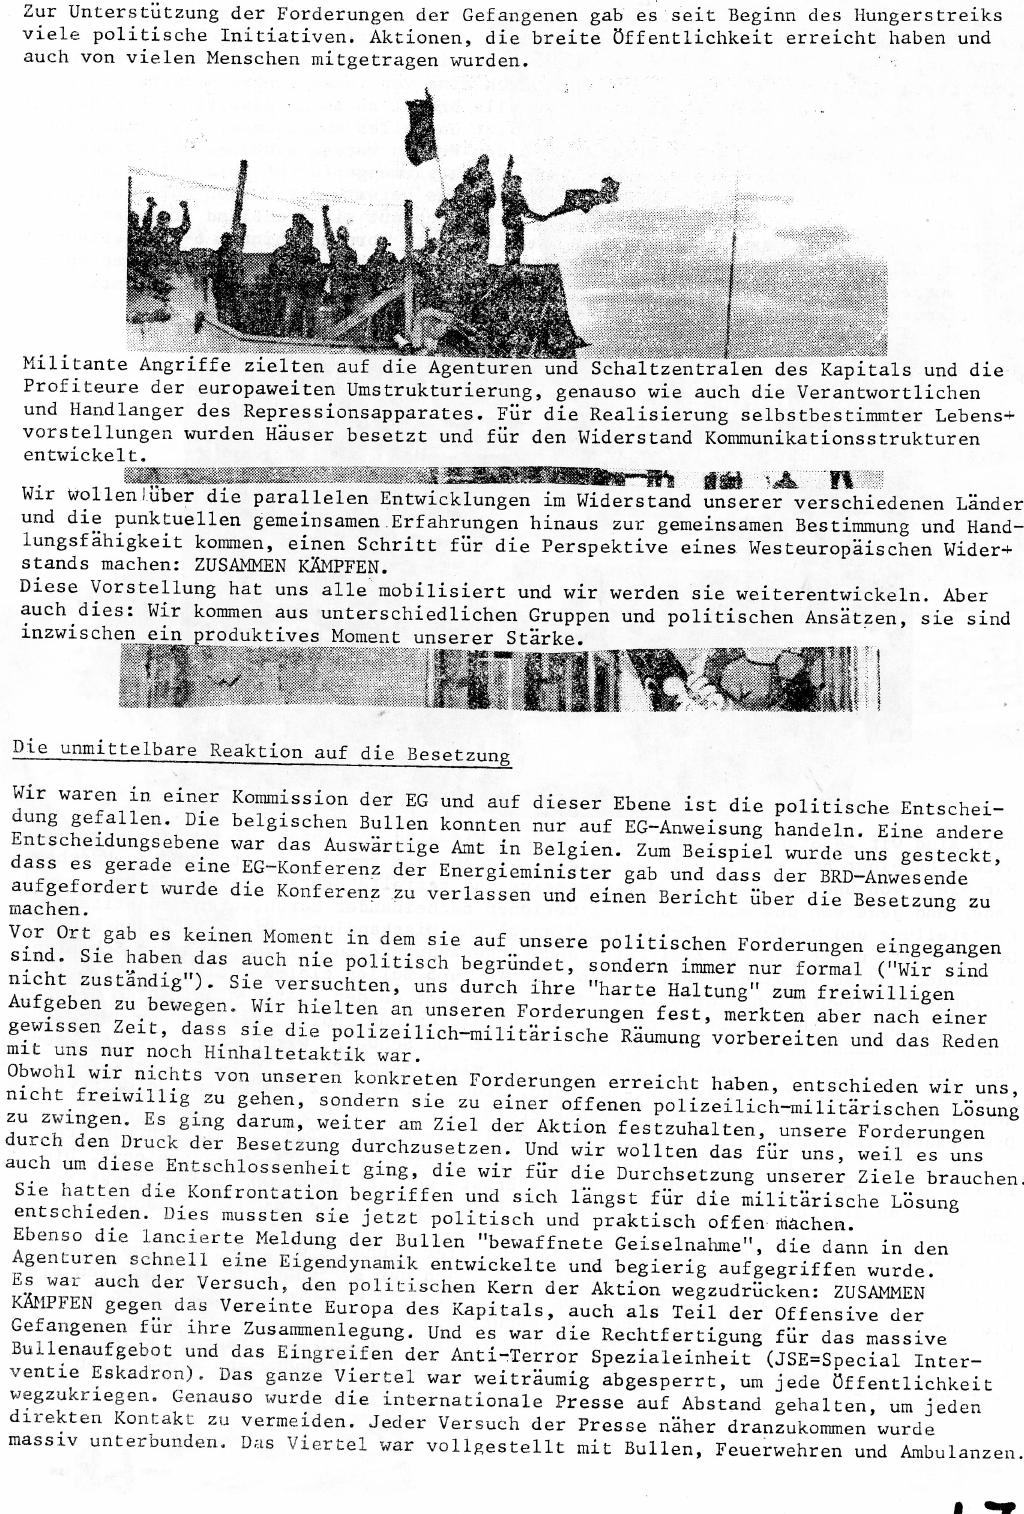 Belgien_Doku_Besetzung_EG_Kommission_1989_069